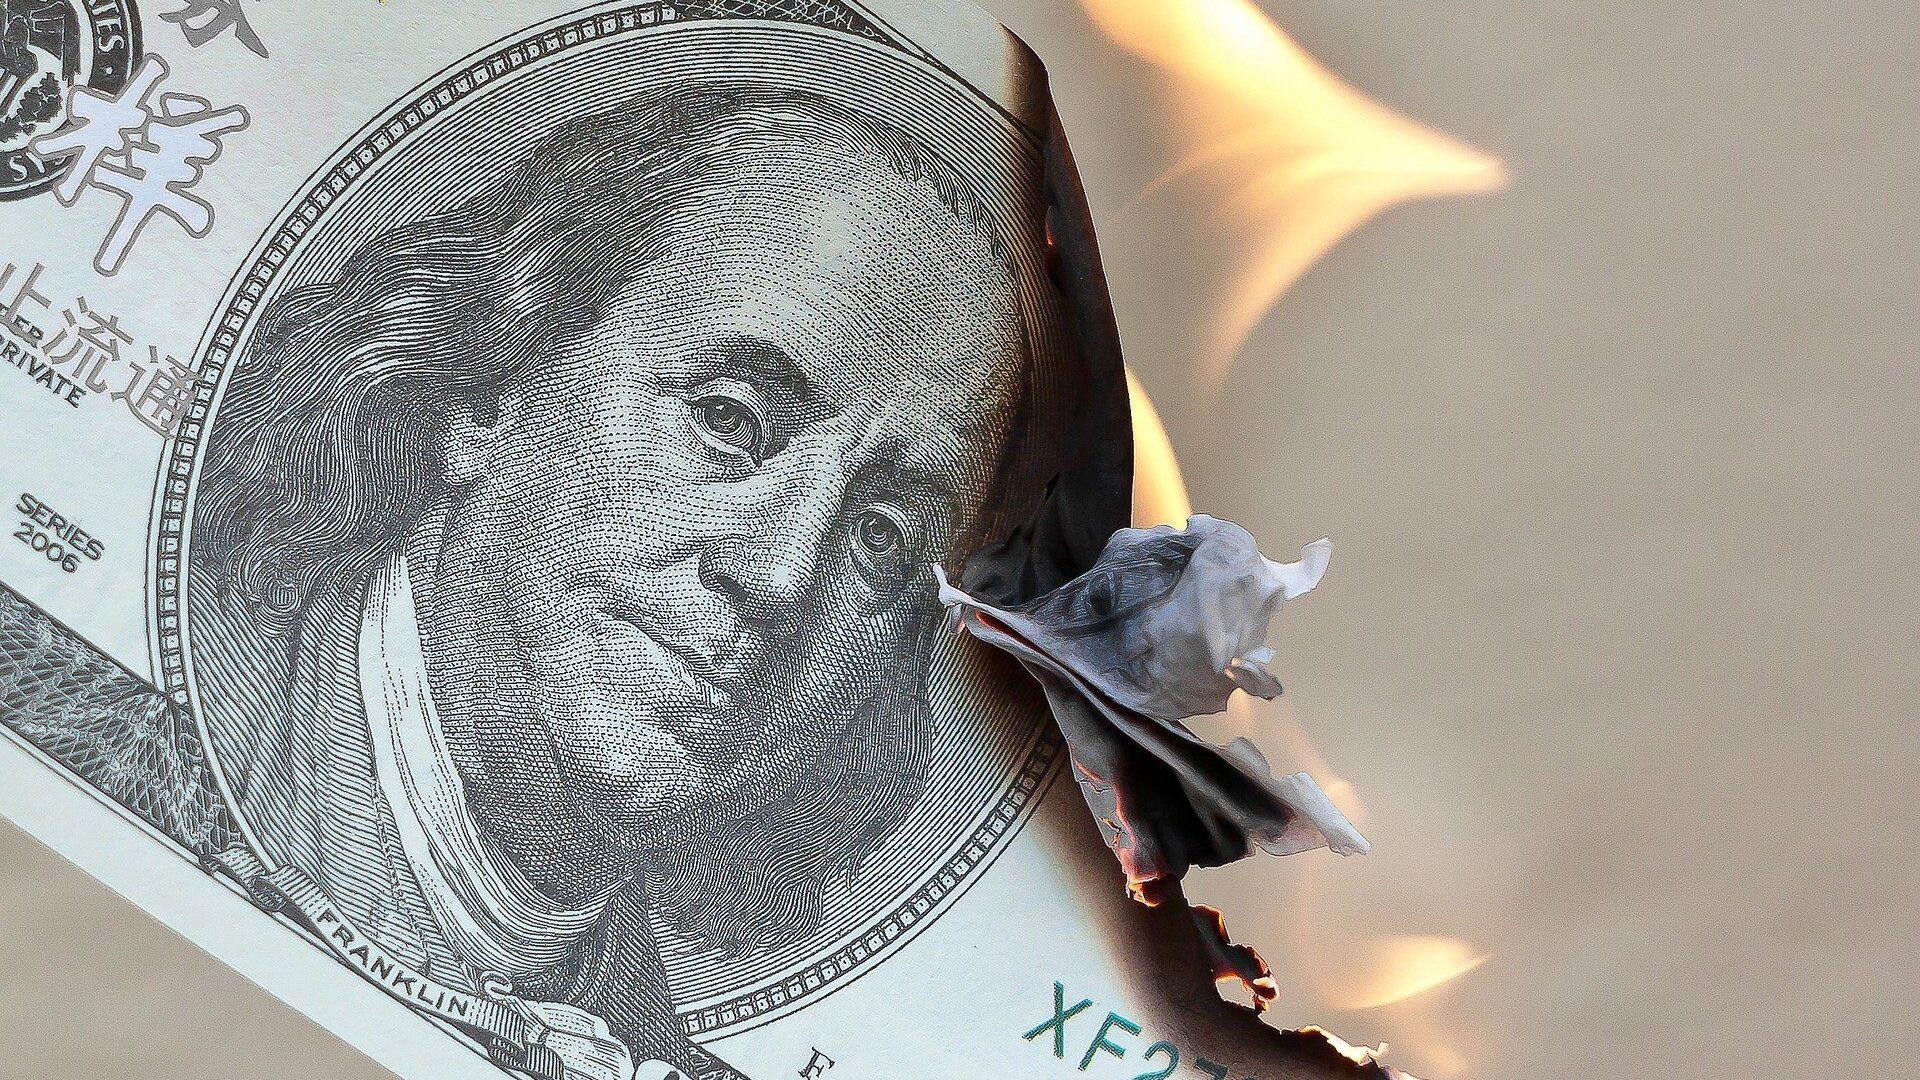 Dollaro bruciato - Sputnik Italia, 1920, 24.06.2021